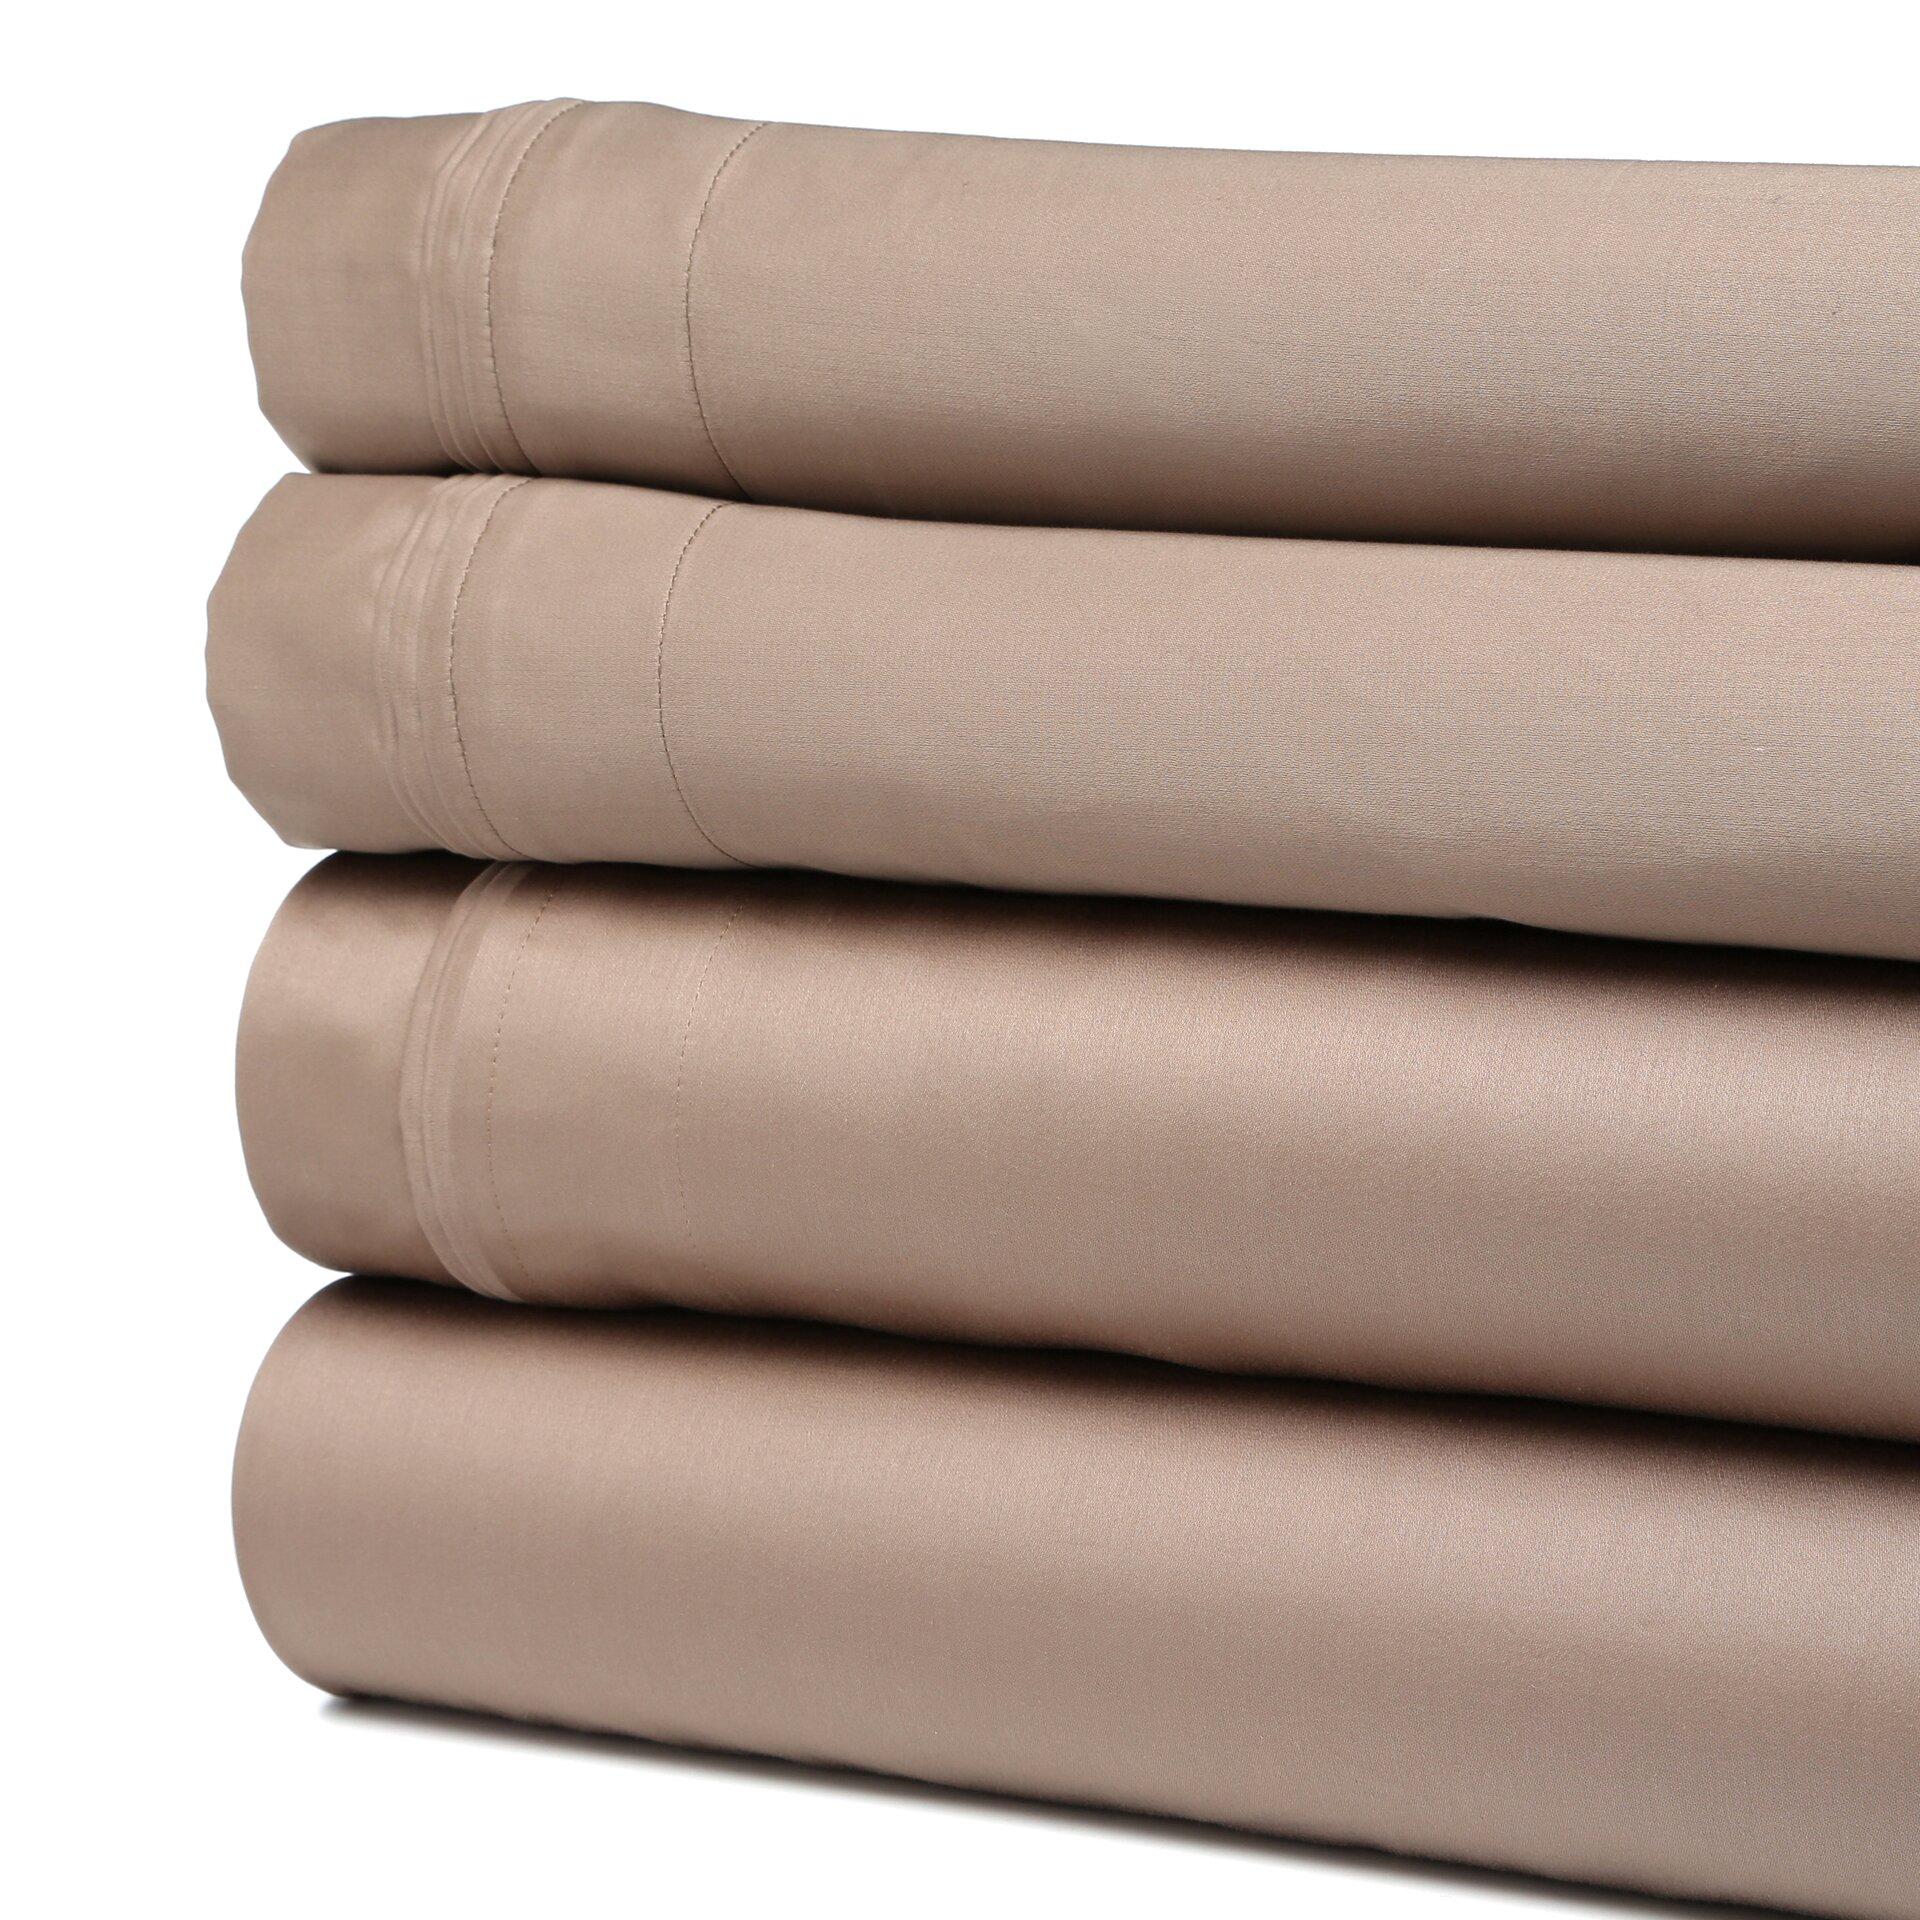 1500 thread count premium long staple combed cotton solid sheet set wayfair. Black Bedroom Furniture Sets. Home Design Ideas